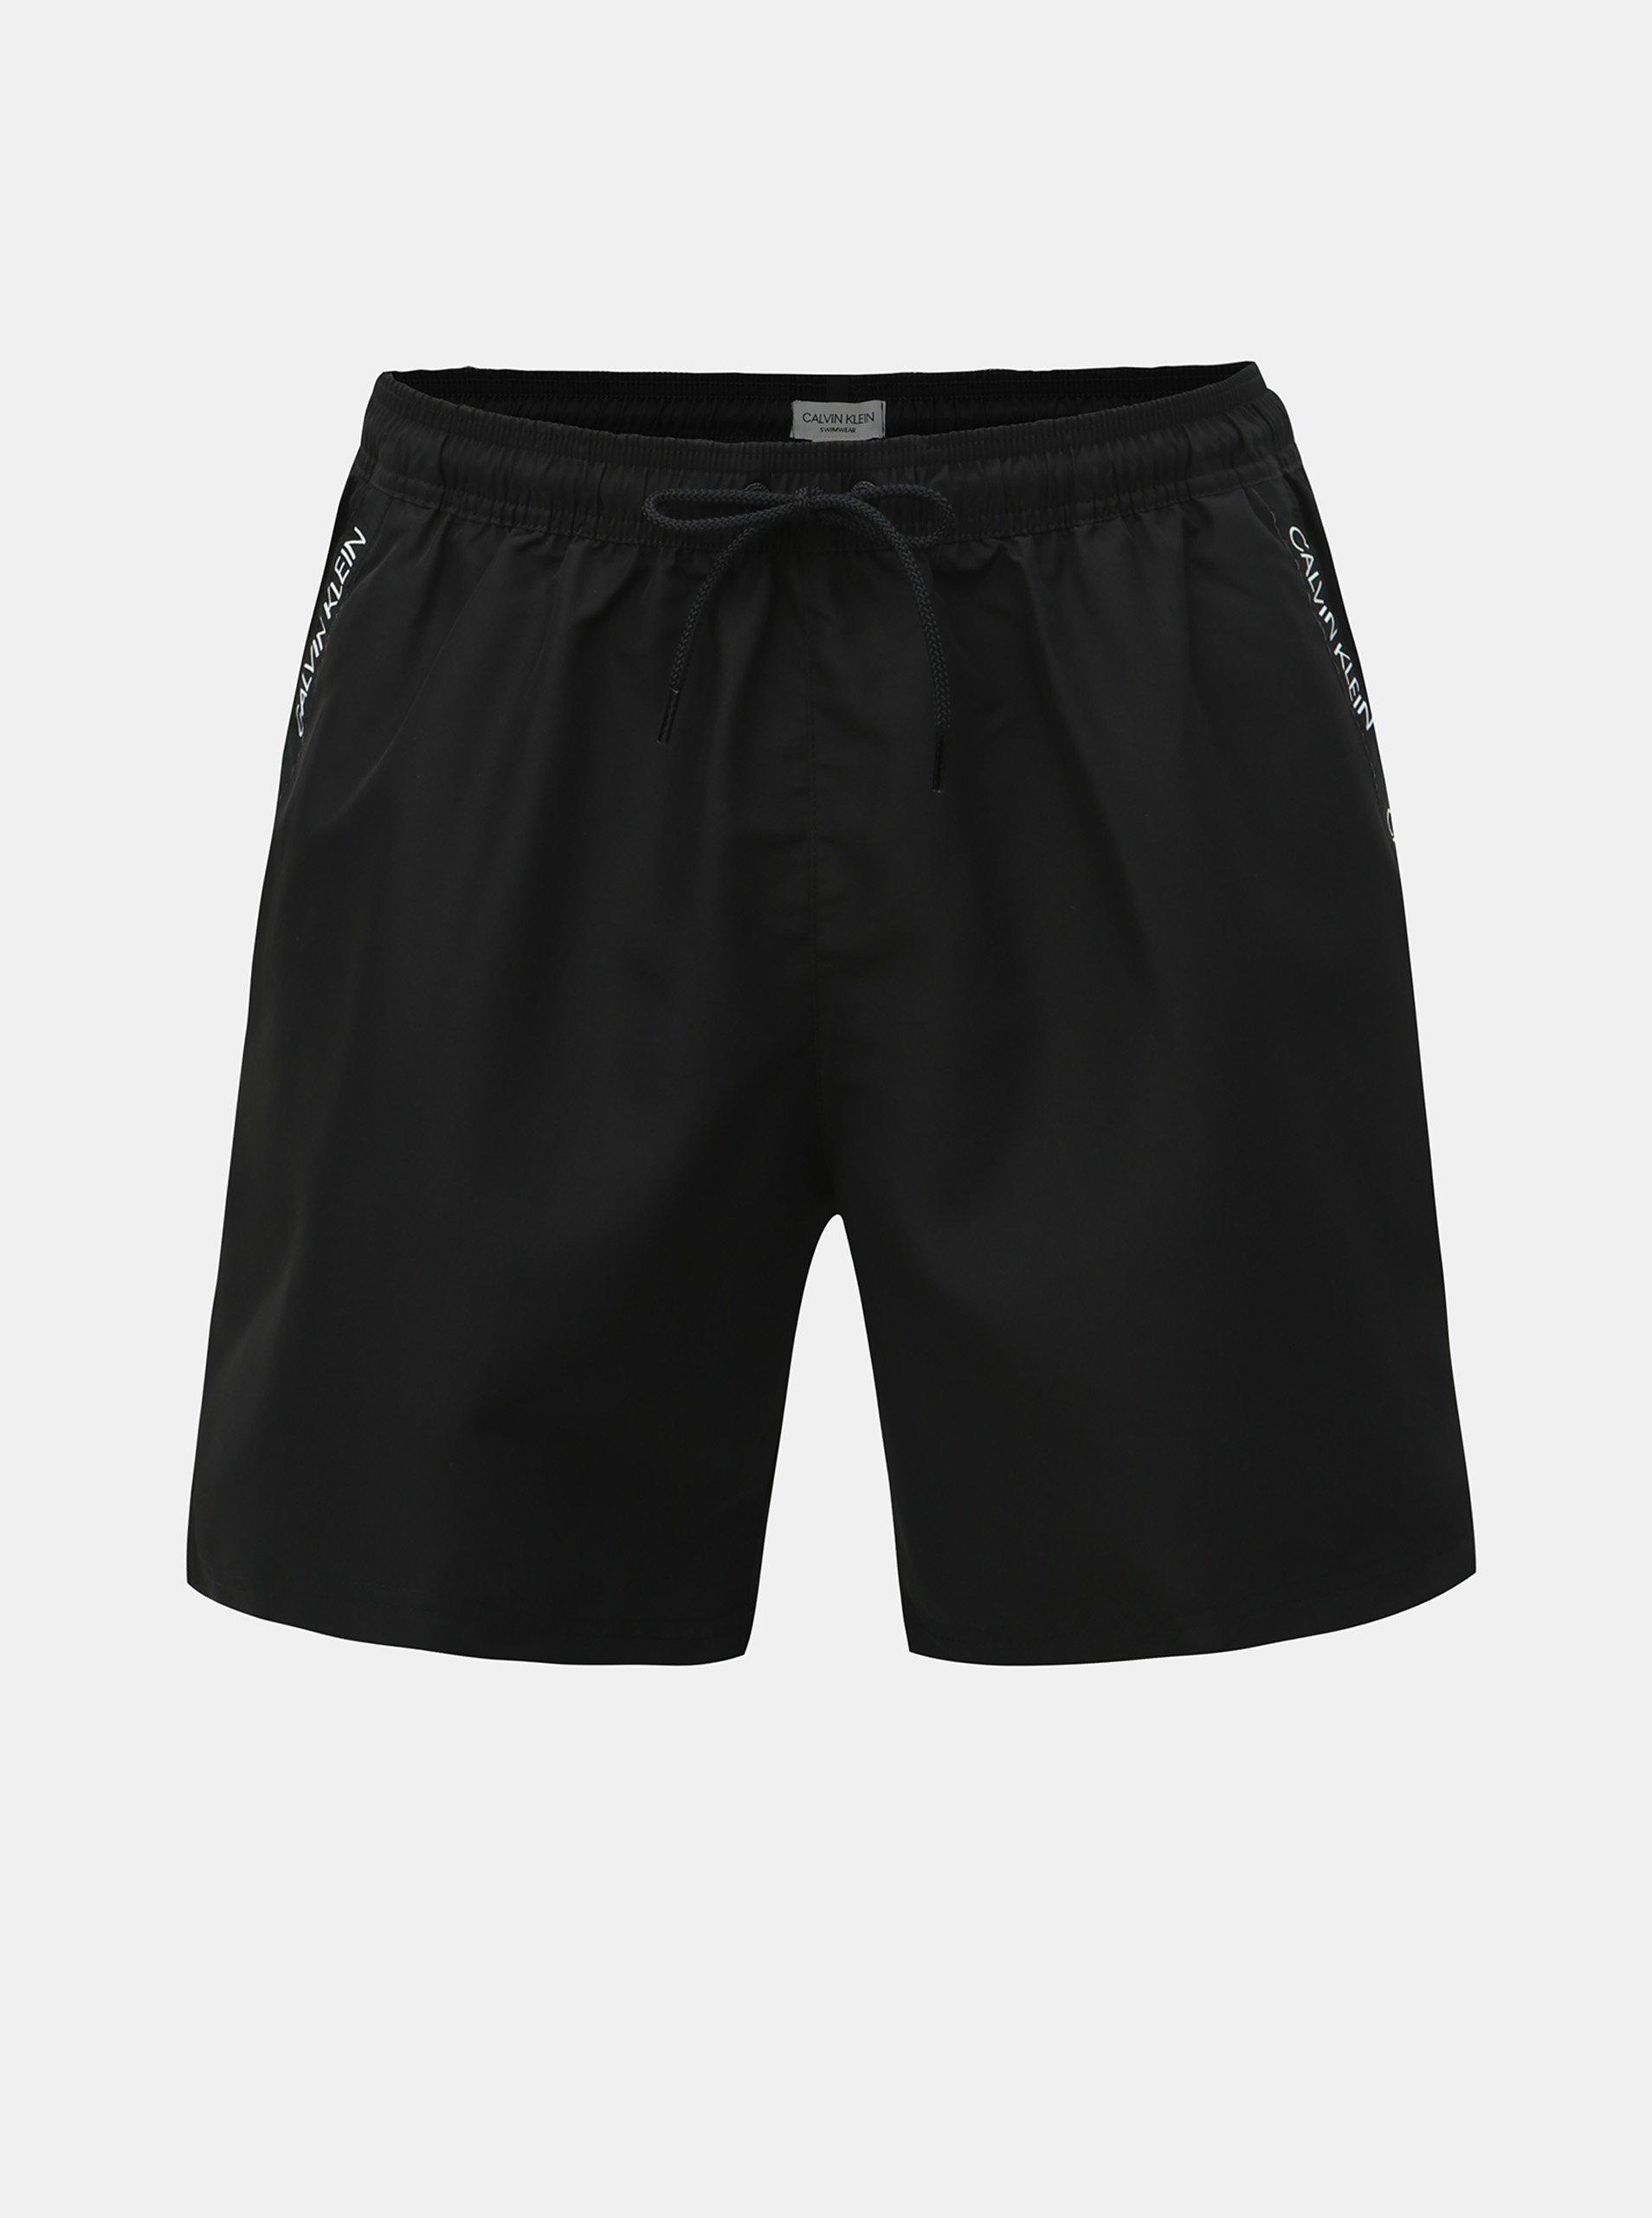 aa67f40dd0 Černé pánské plavky Calvin Klein Underwear